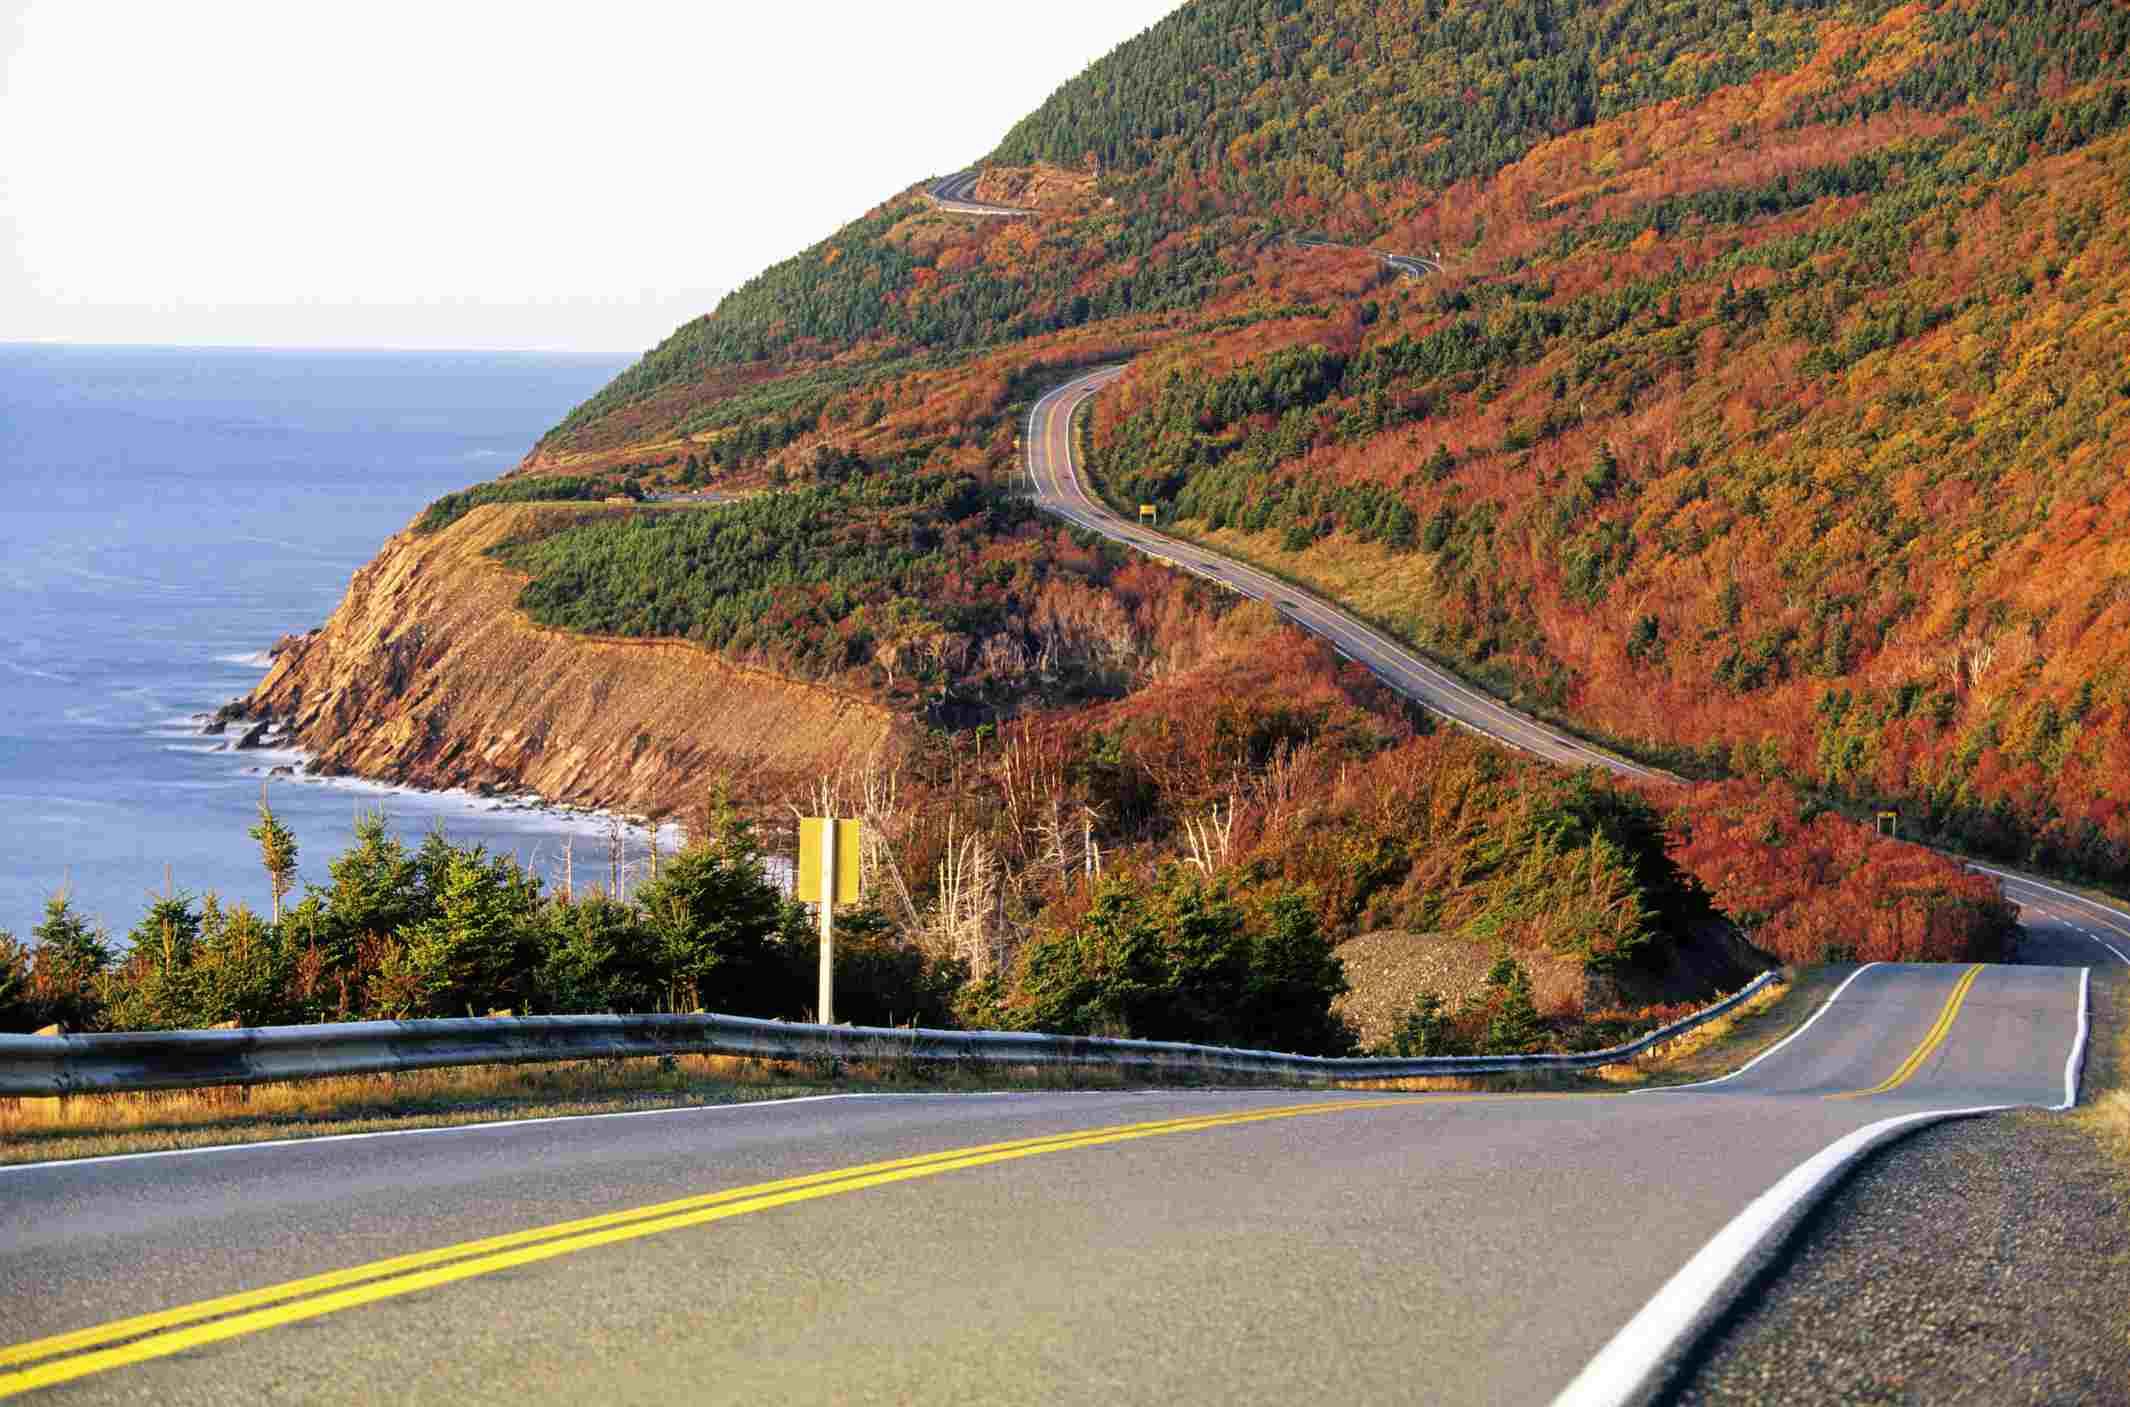 Coastal highway, French Mountain, Cabot Trail, Cape Breton Highlands National Park, Nova Scotia, Canada.